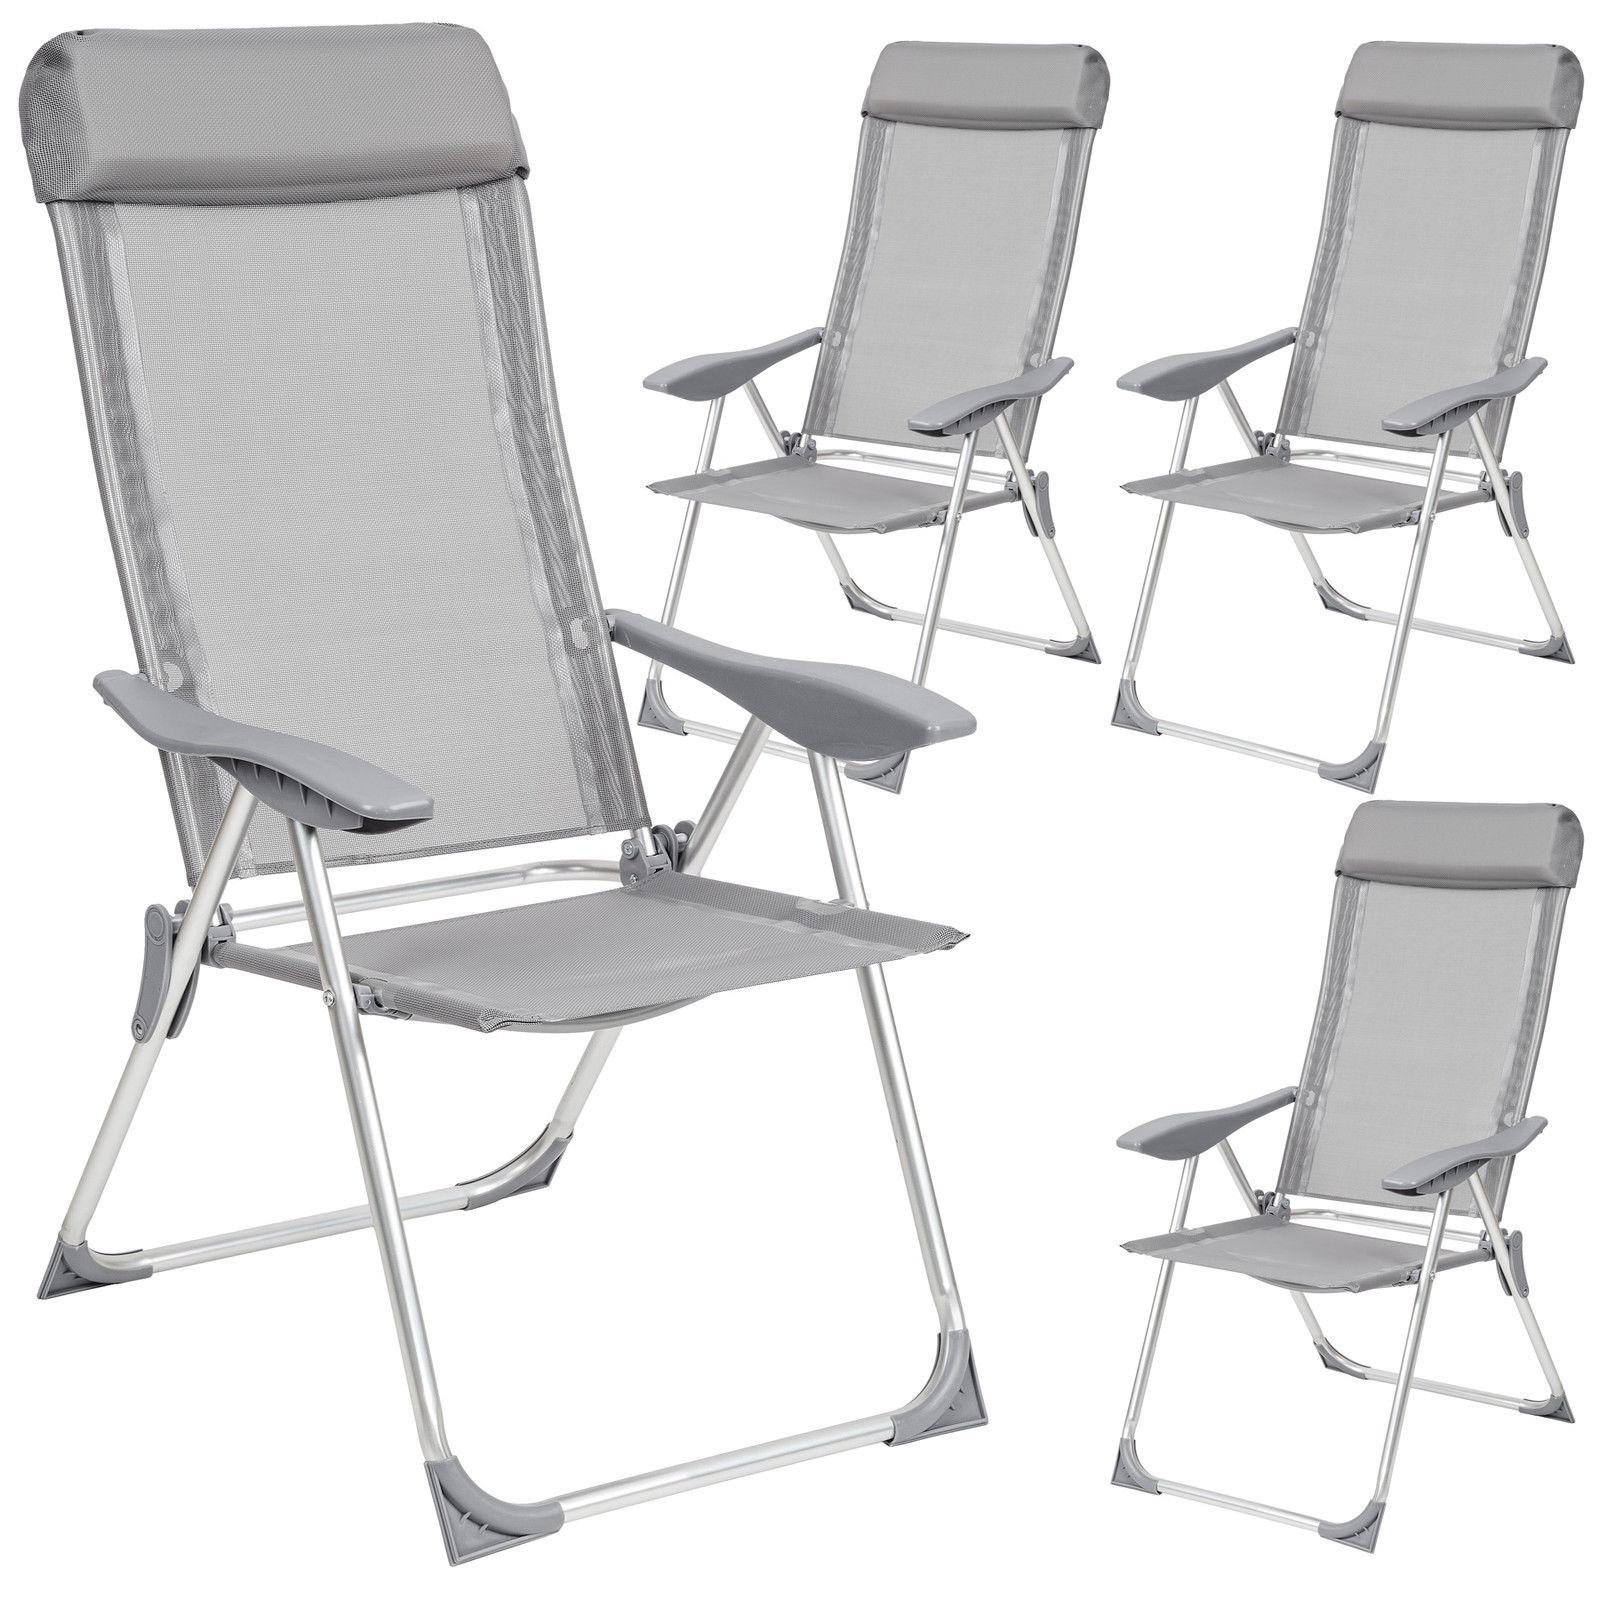 Set 4 Aluminium folding garden chairs outdoors tenting patio furnishings silver